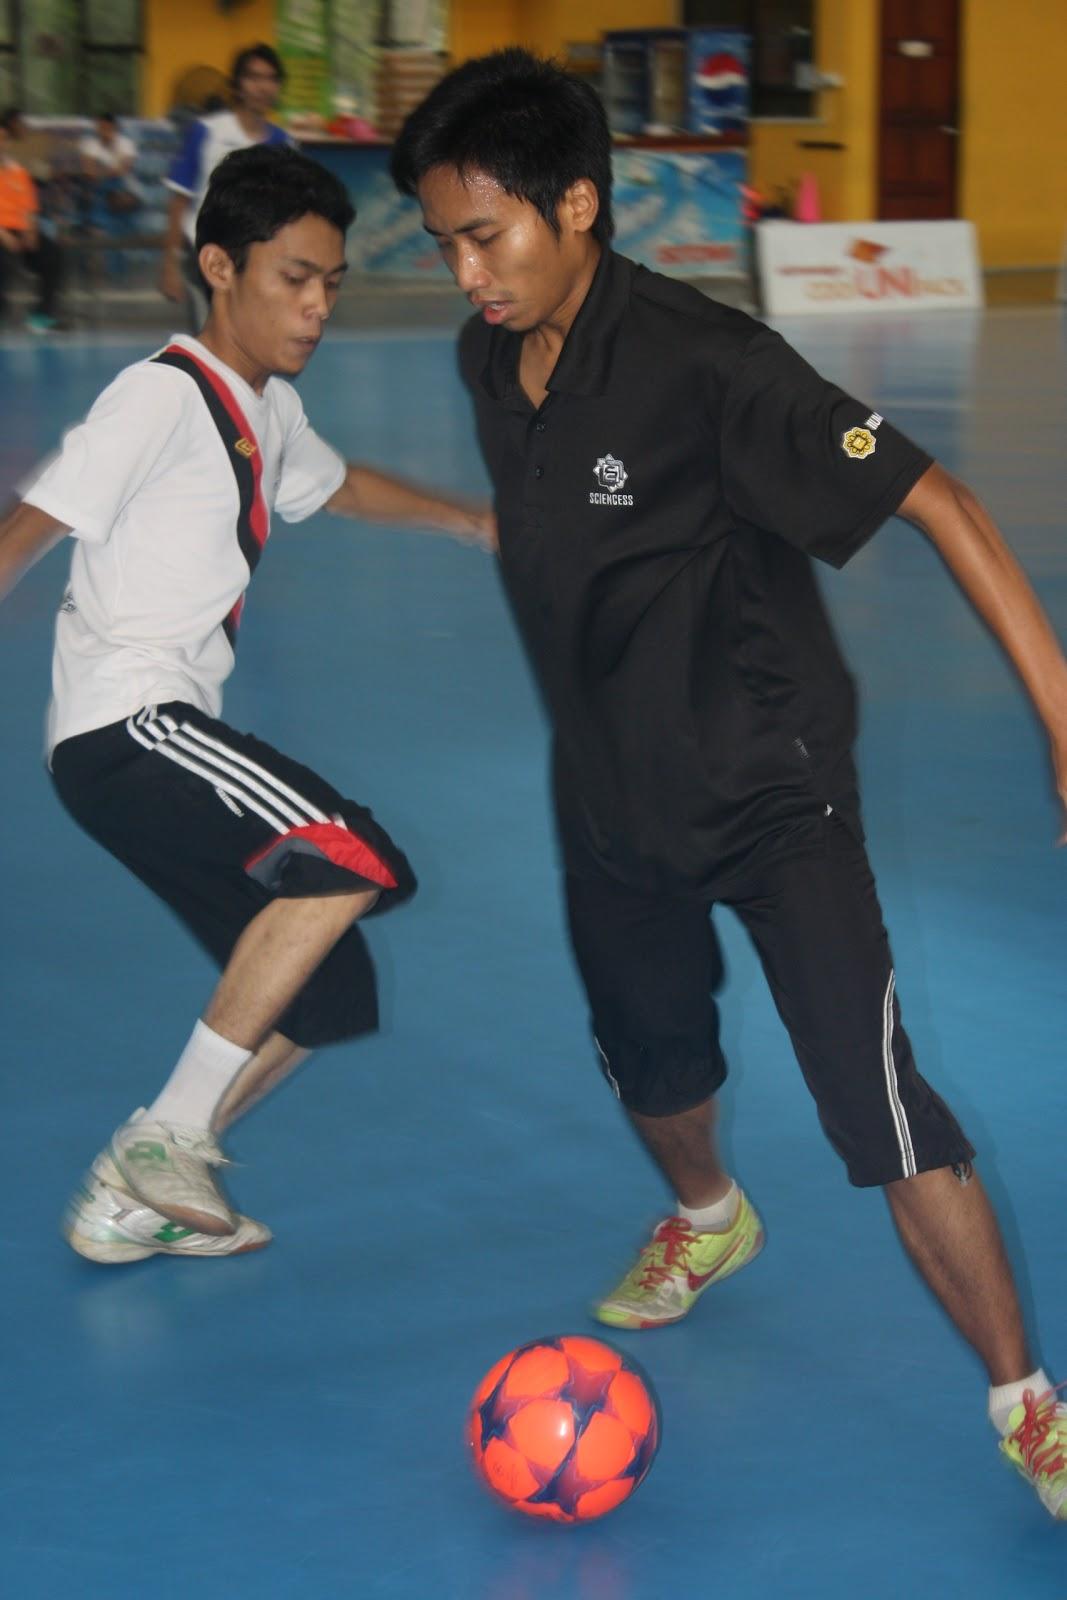 Sejarah Futsal : sejarah, futsal, Mercik!!, Futsal, Sejarah